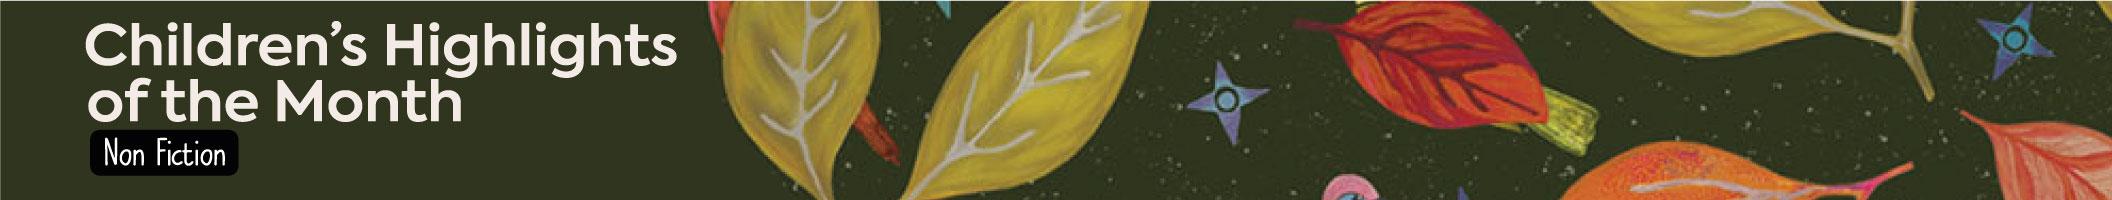 CHOTM Landing Page banner non fiction 2112x200